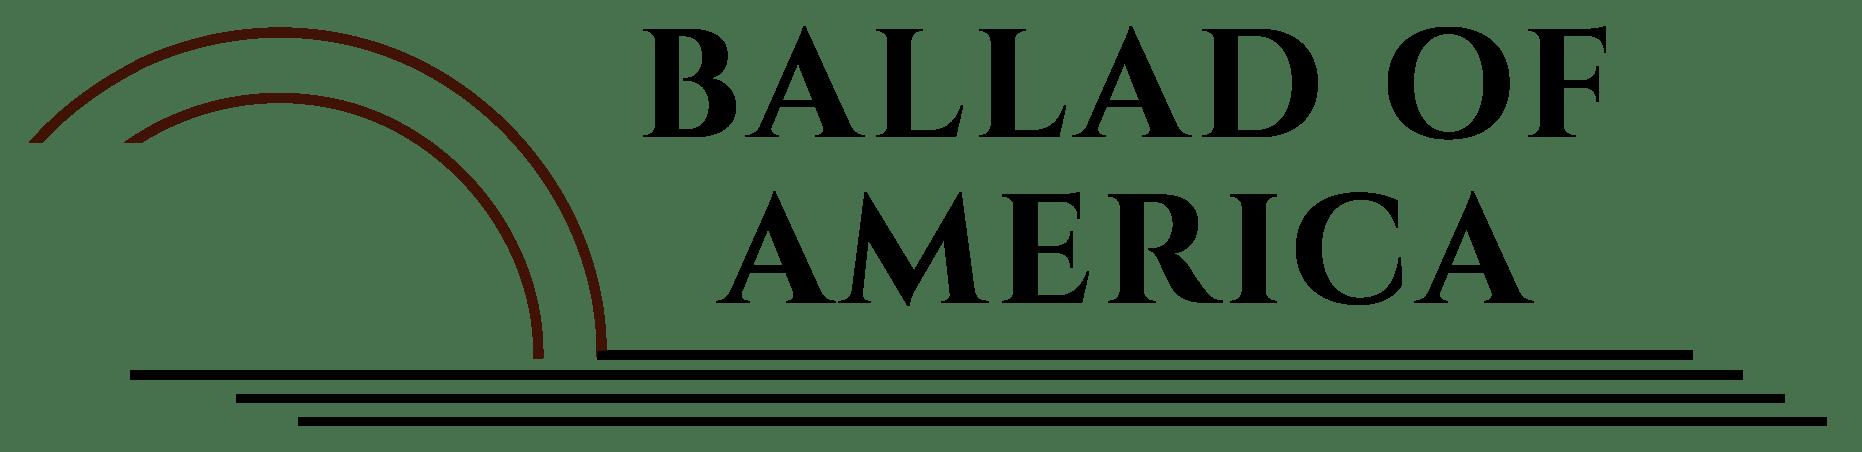 Ballad of America, Inc.